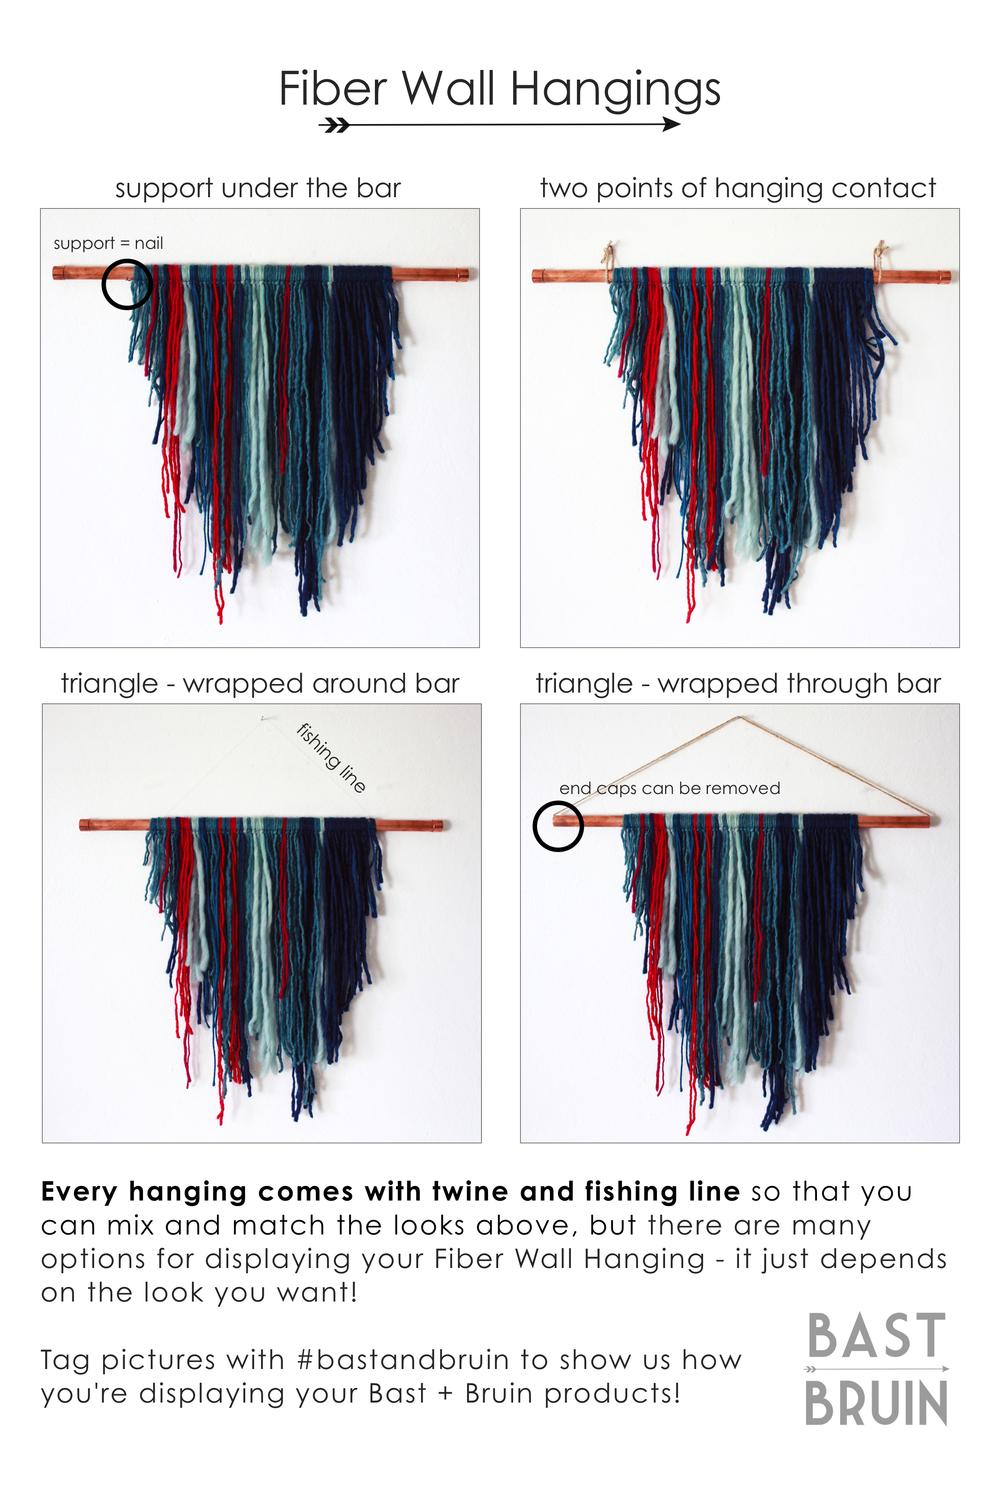 bast-bruin-fiber-hanging-3_alt4.jpeg